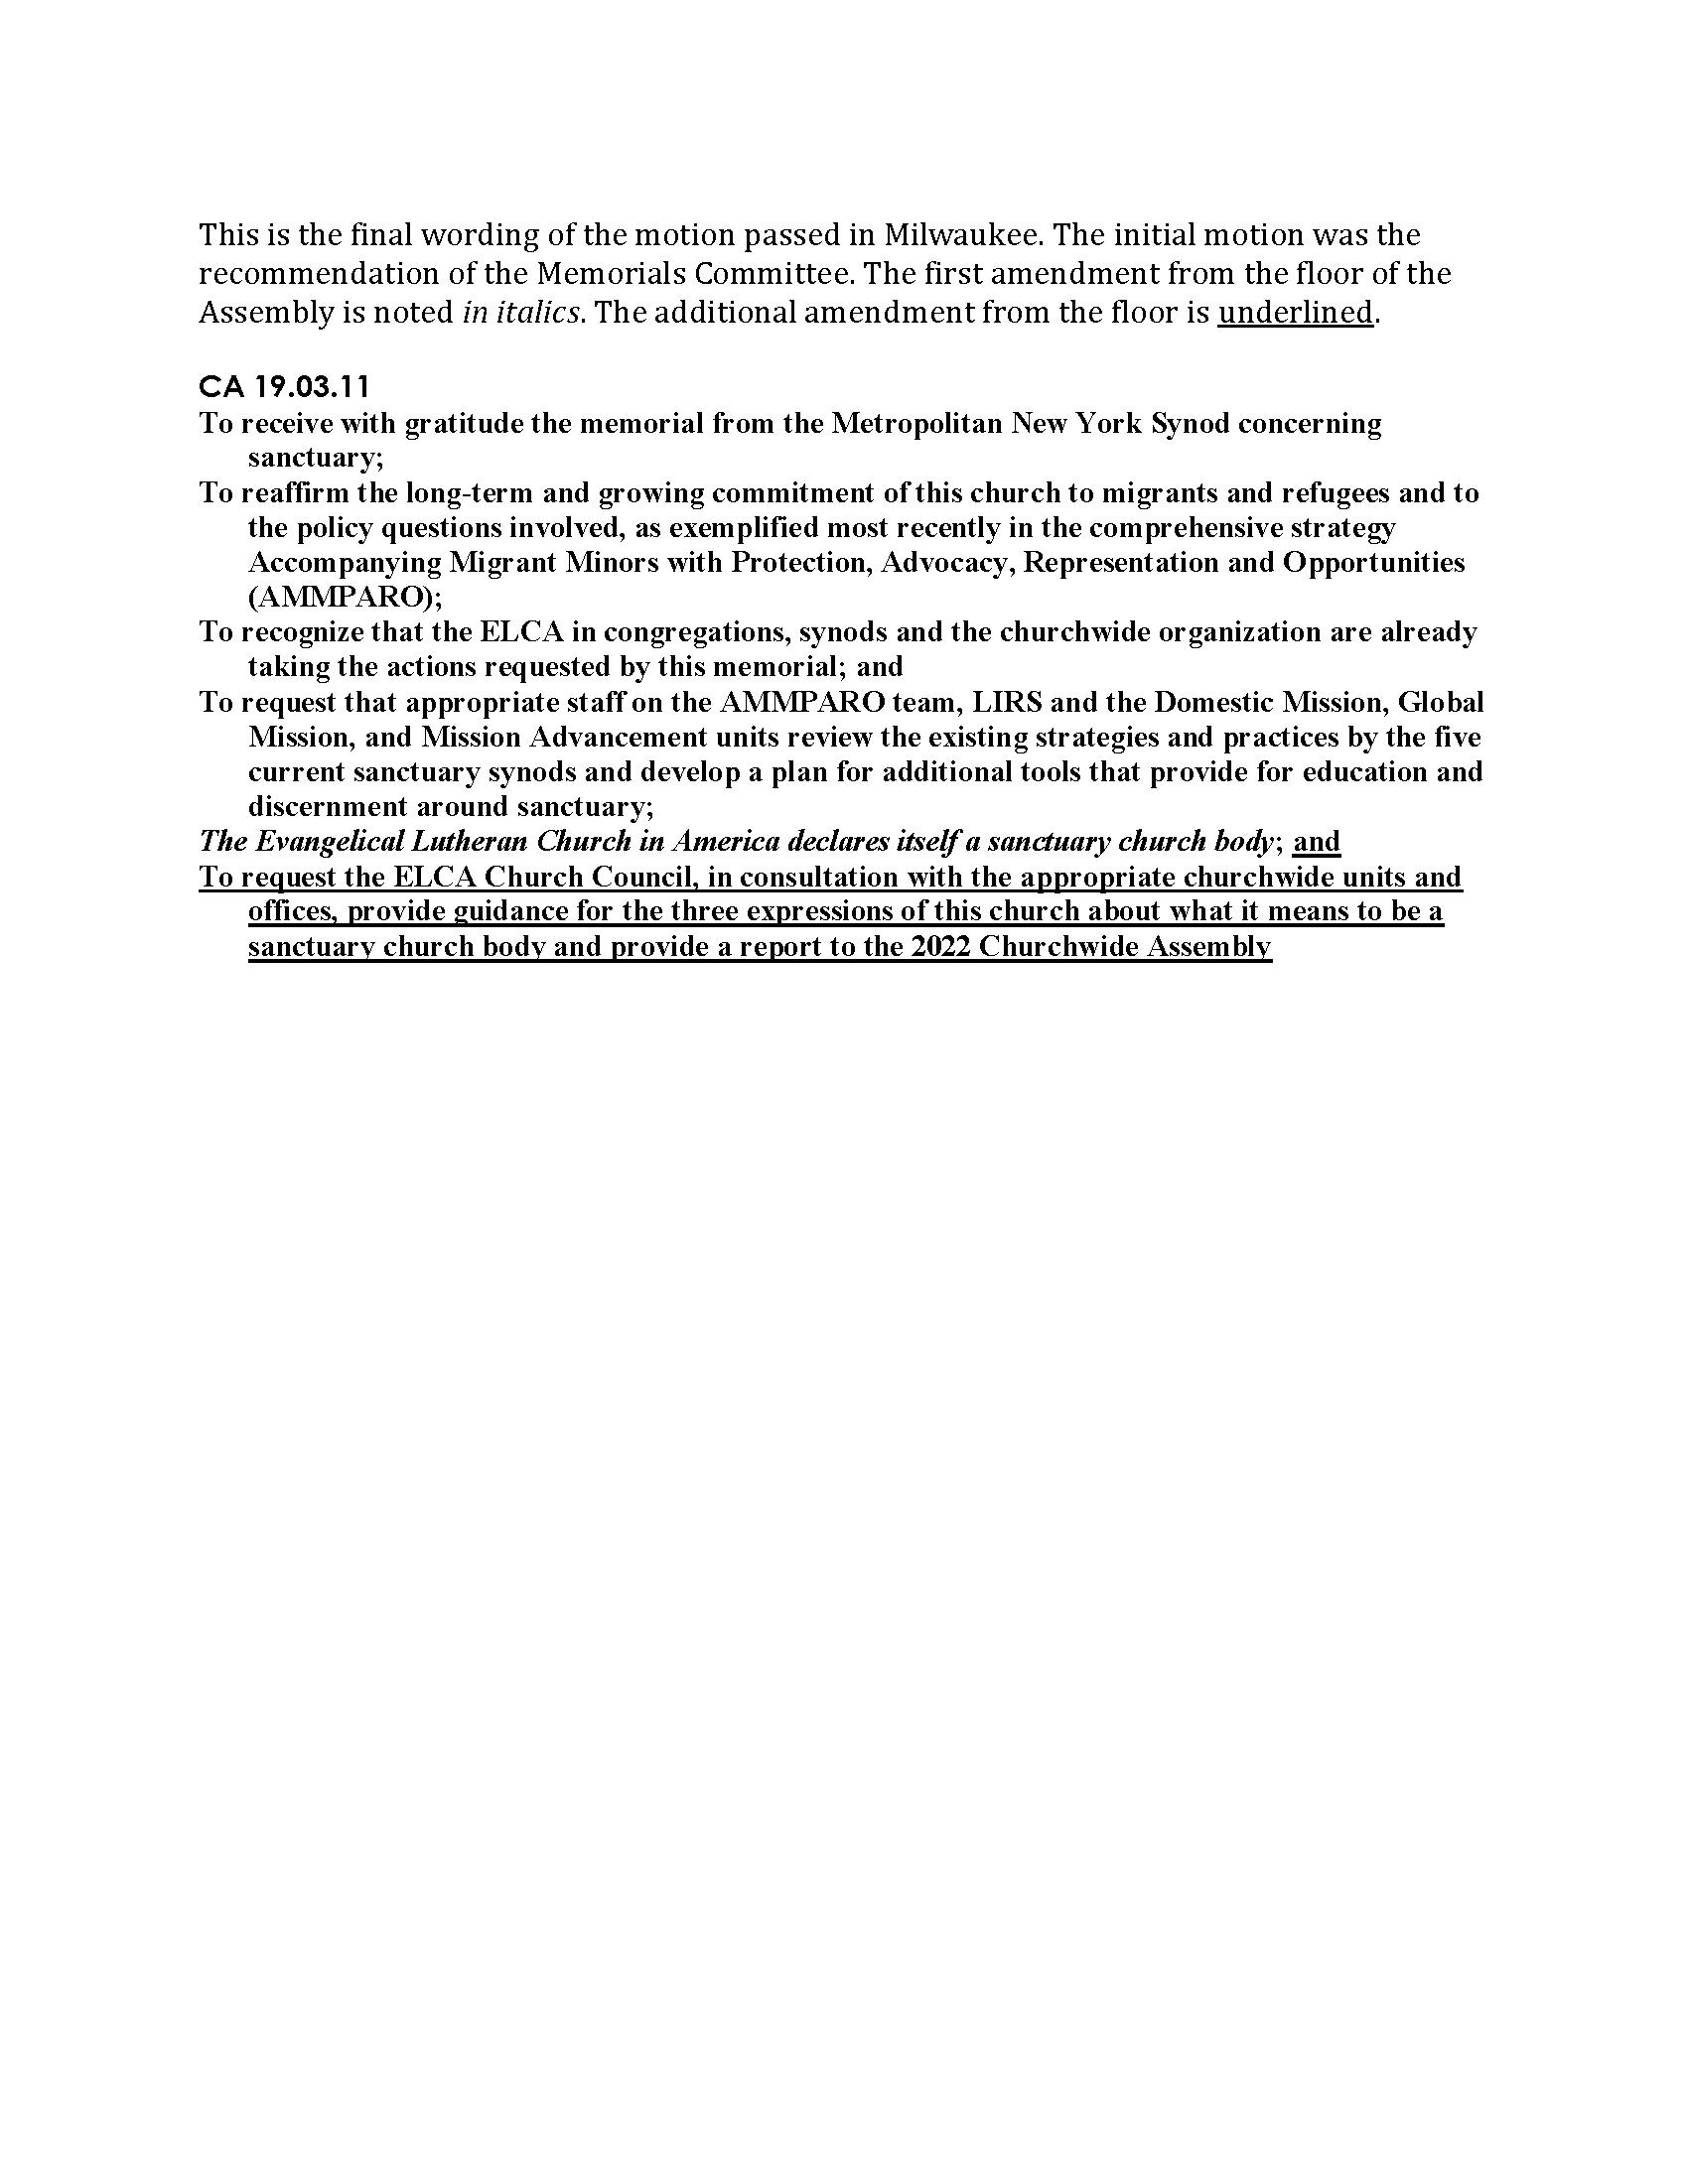 NS_Ltr_Re_Sanctuary_Church_081219_Page_4.png